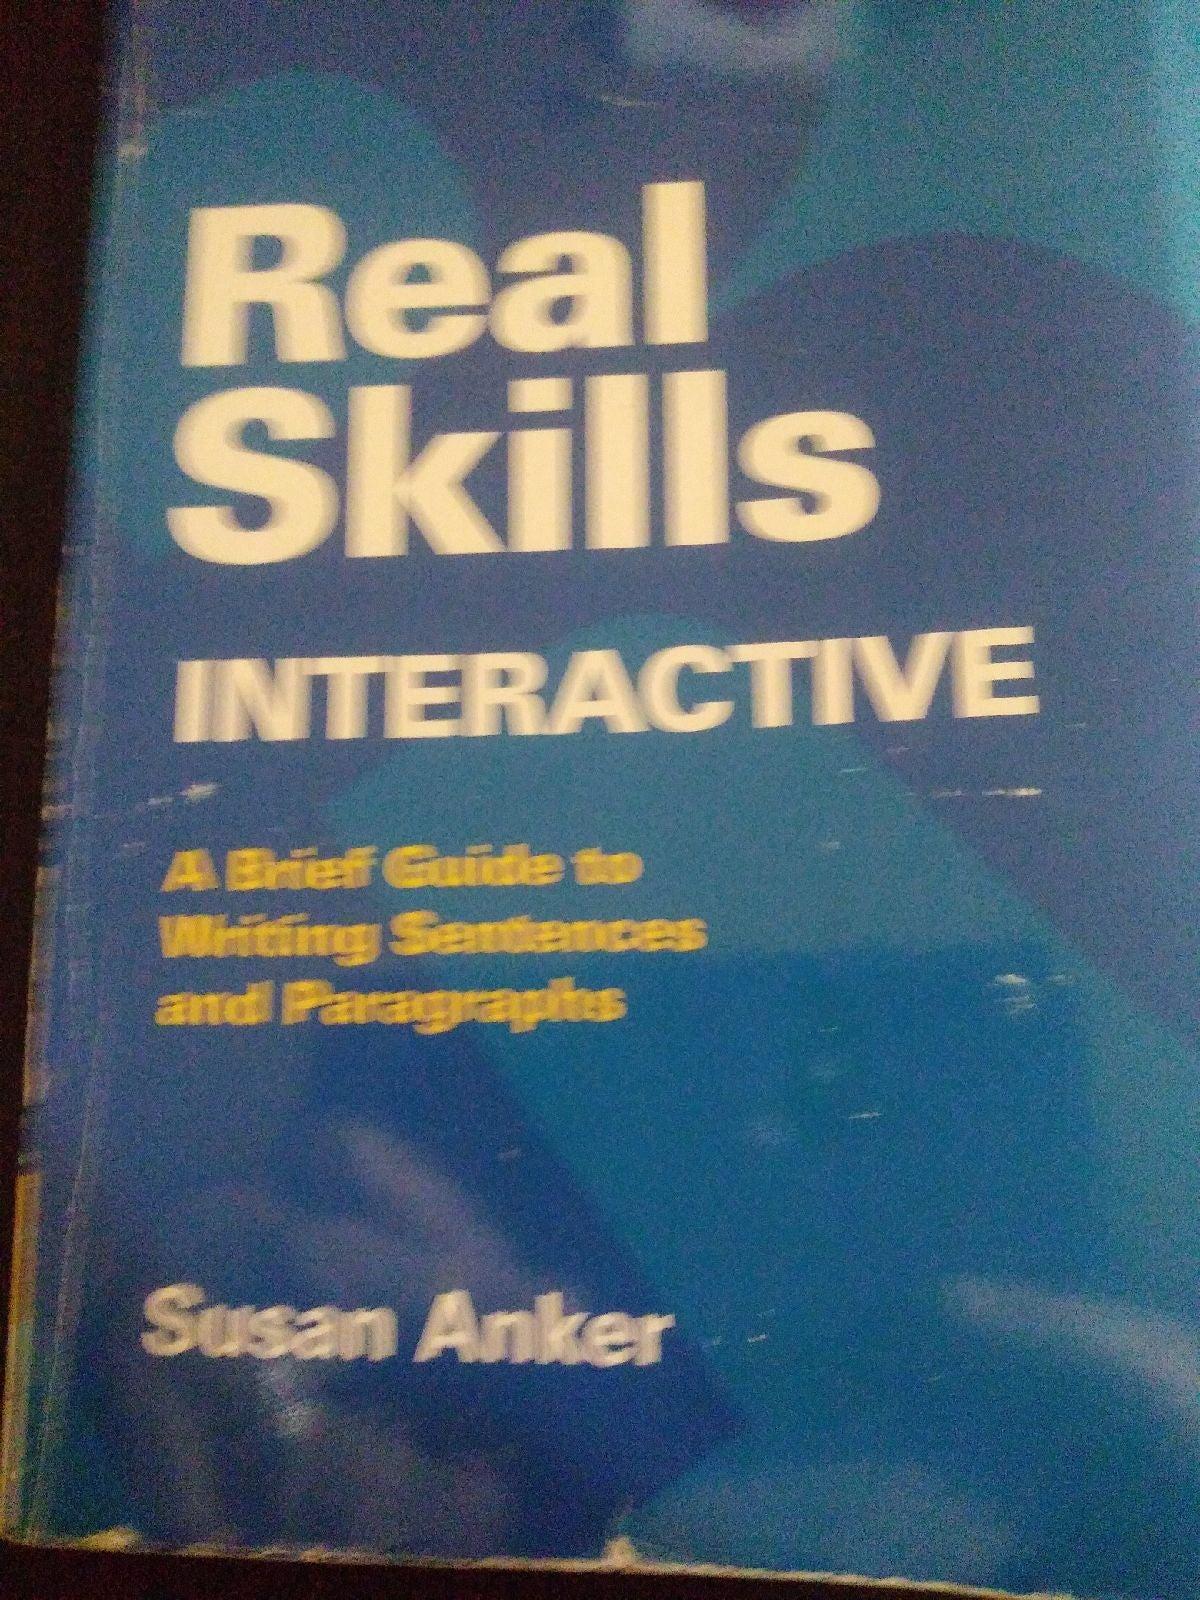 real skills book interactive by Susan An